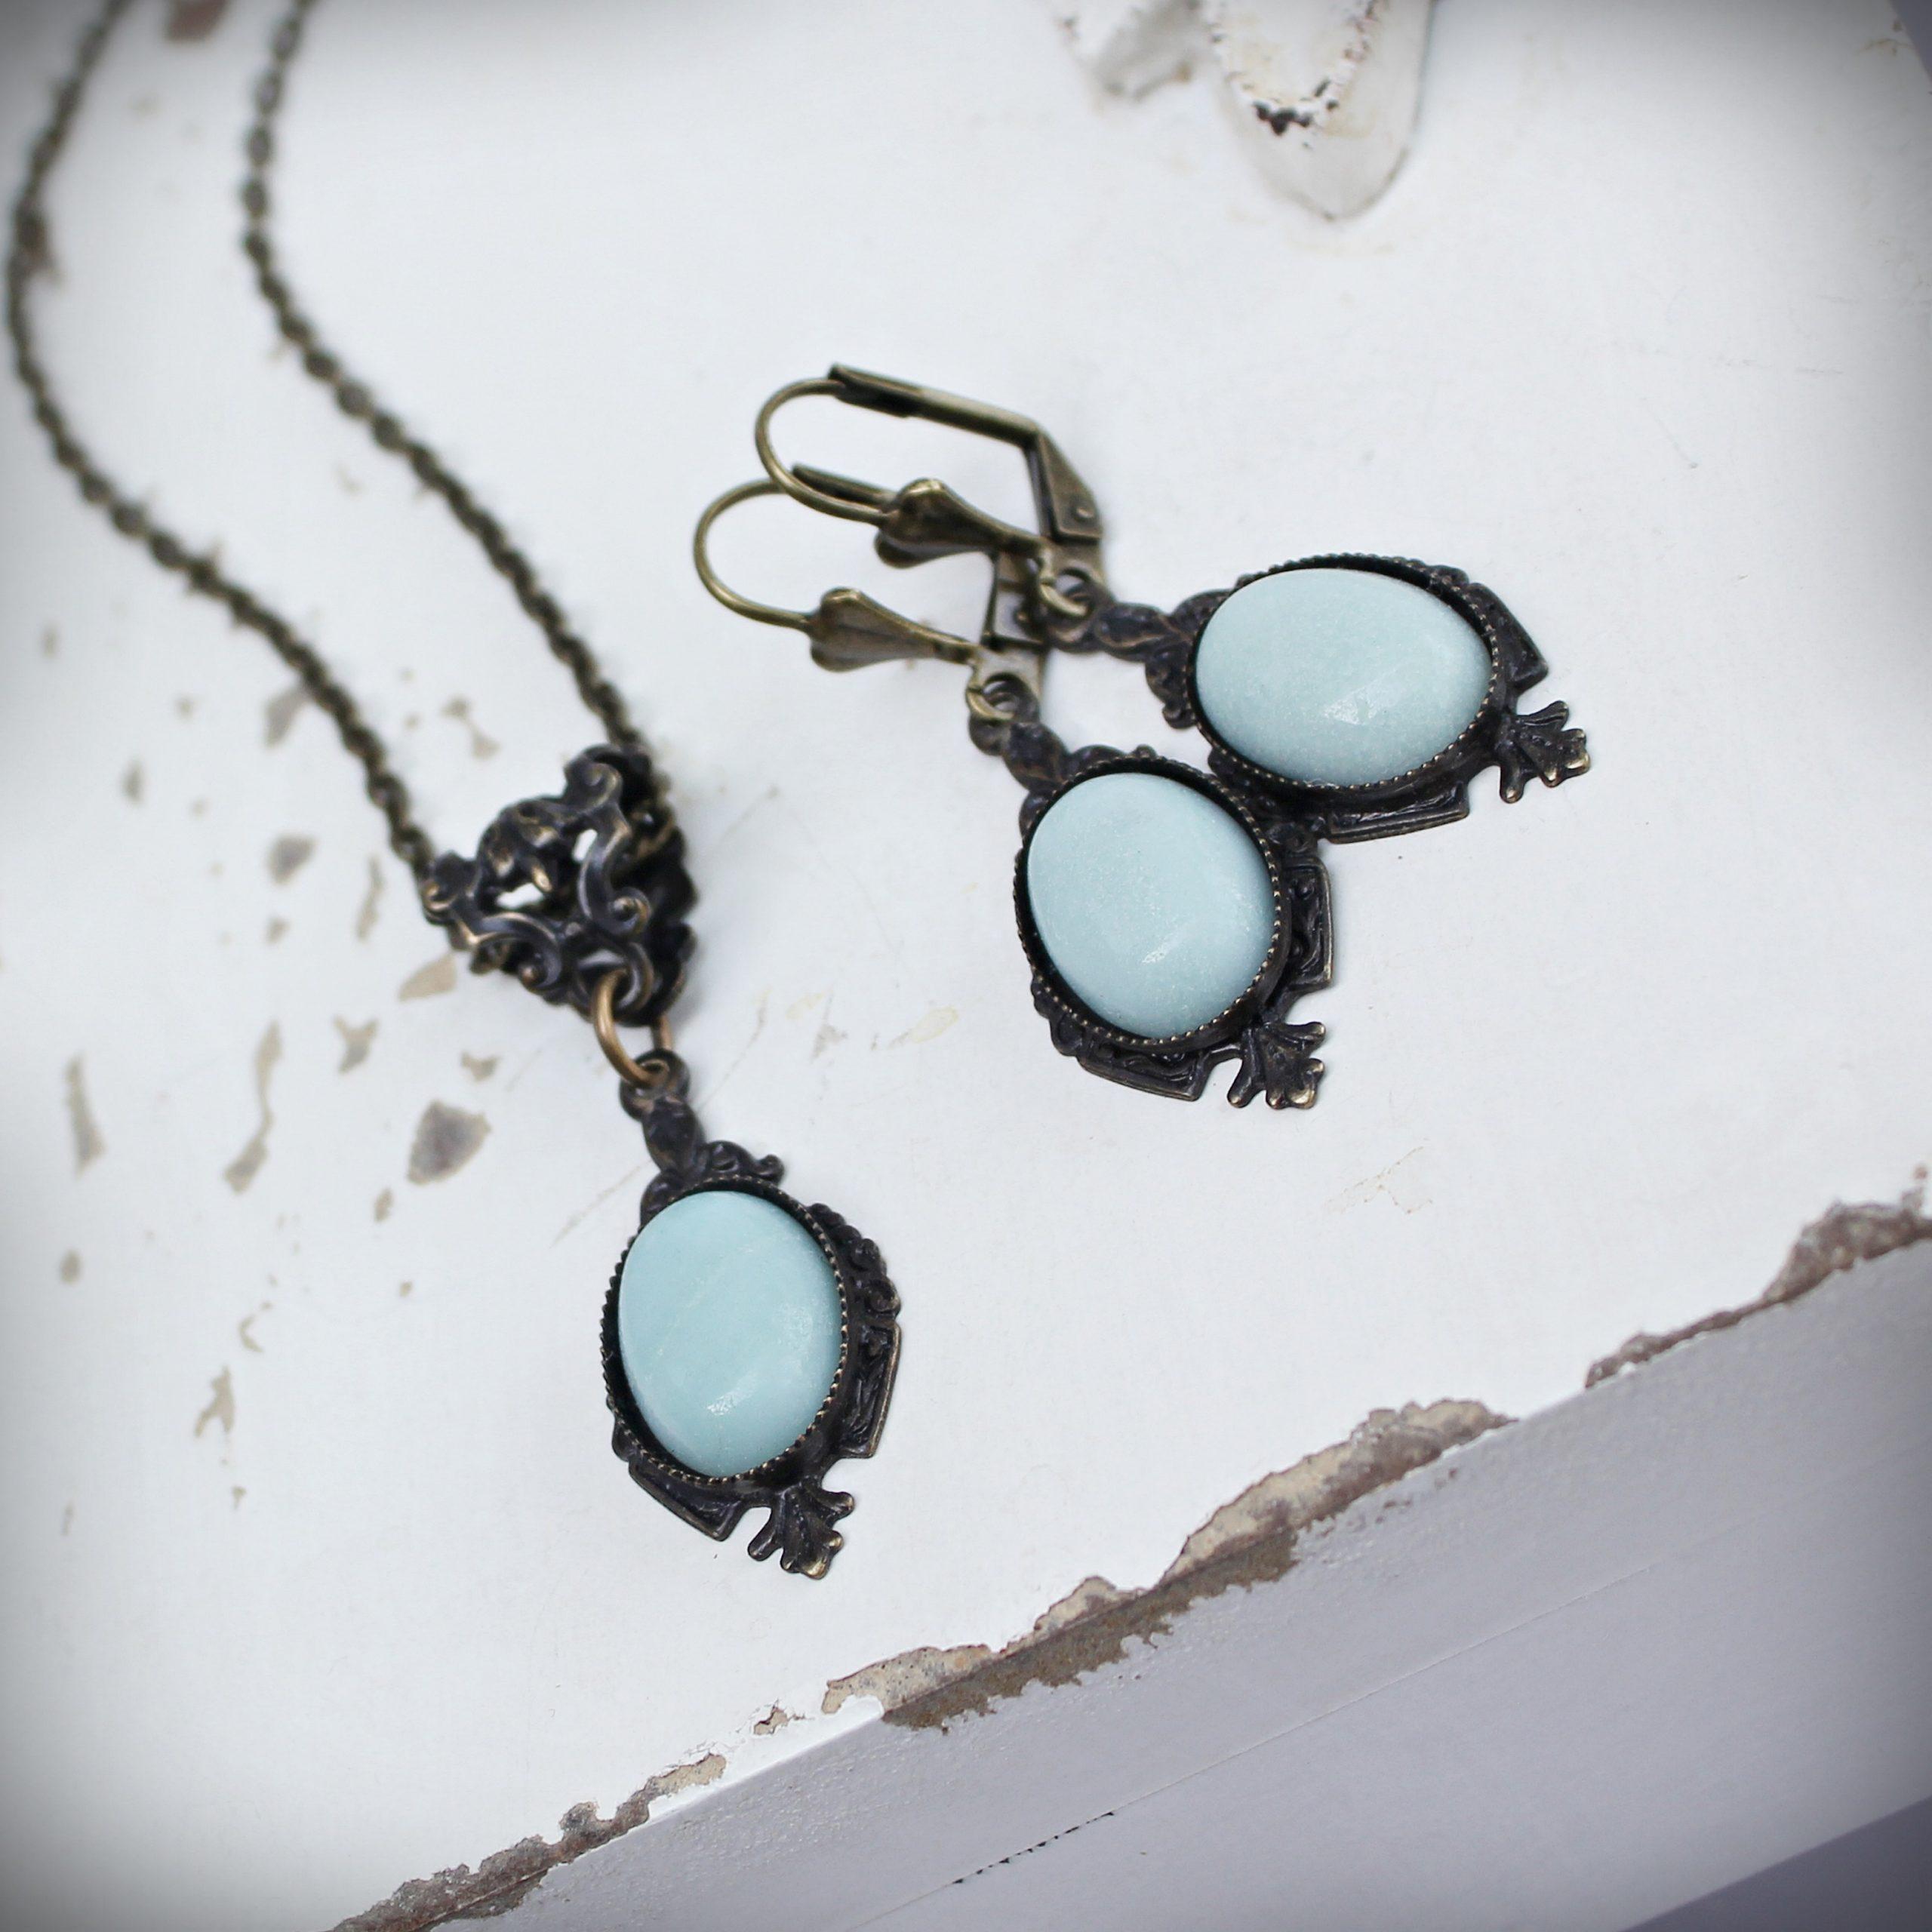 amazonite necklace earrings